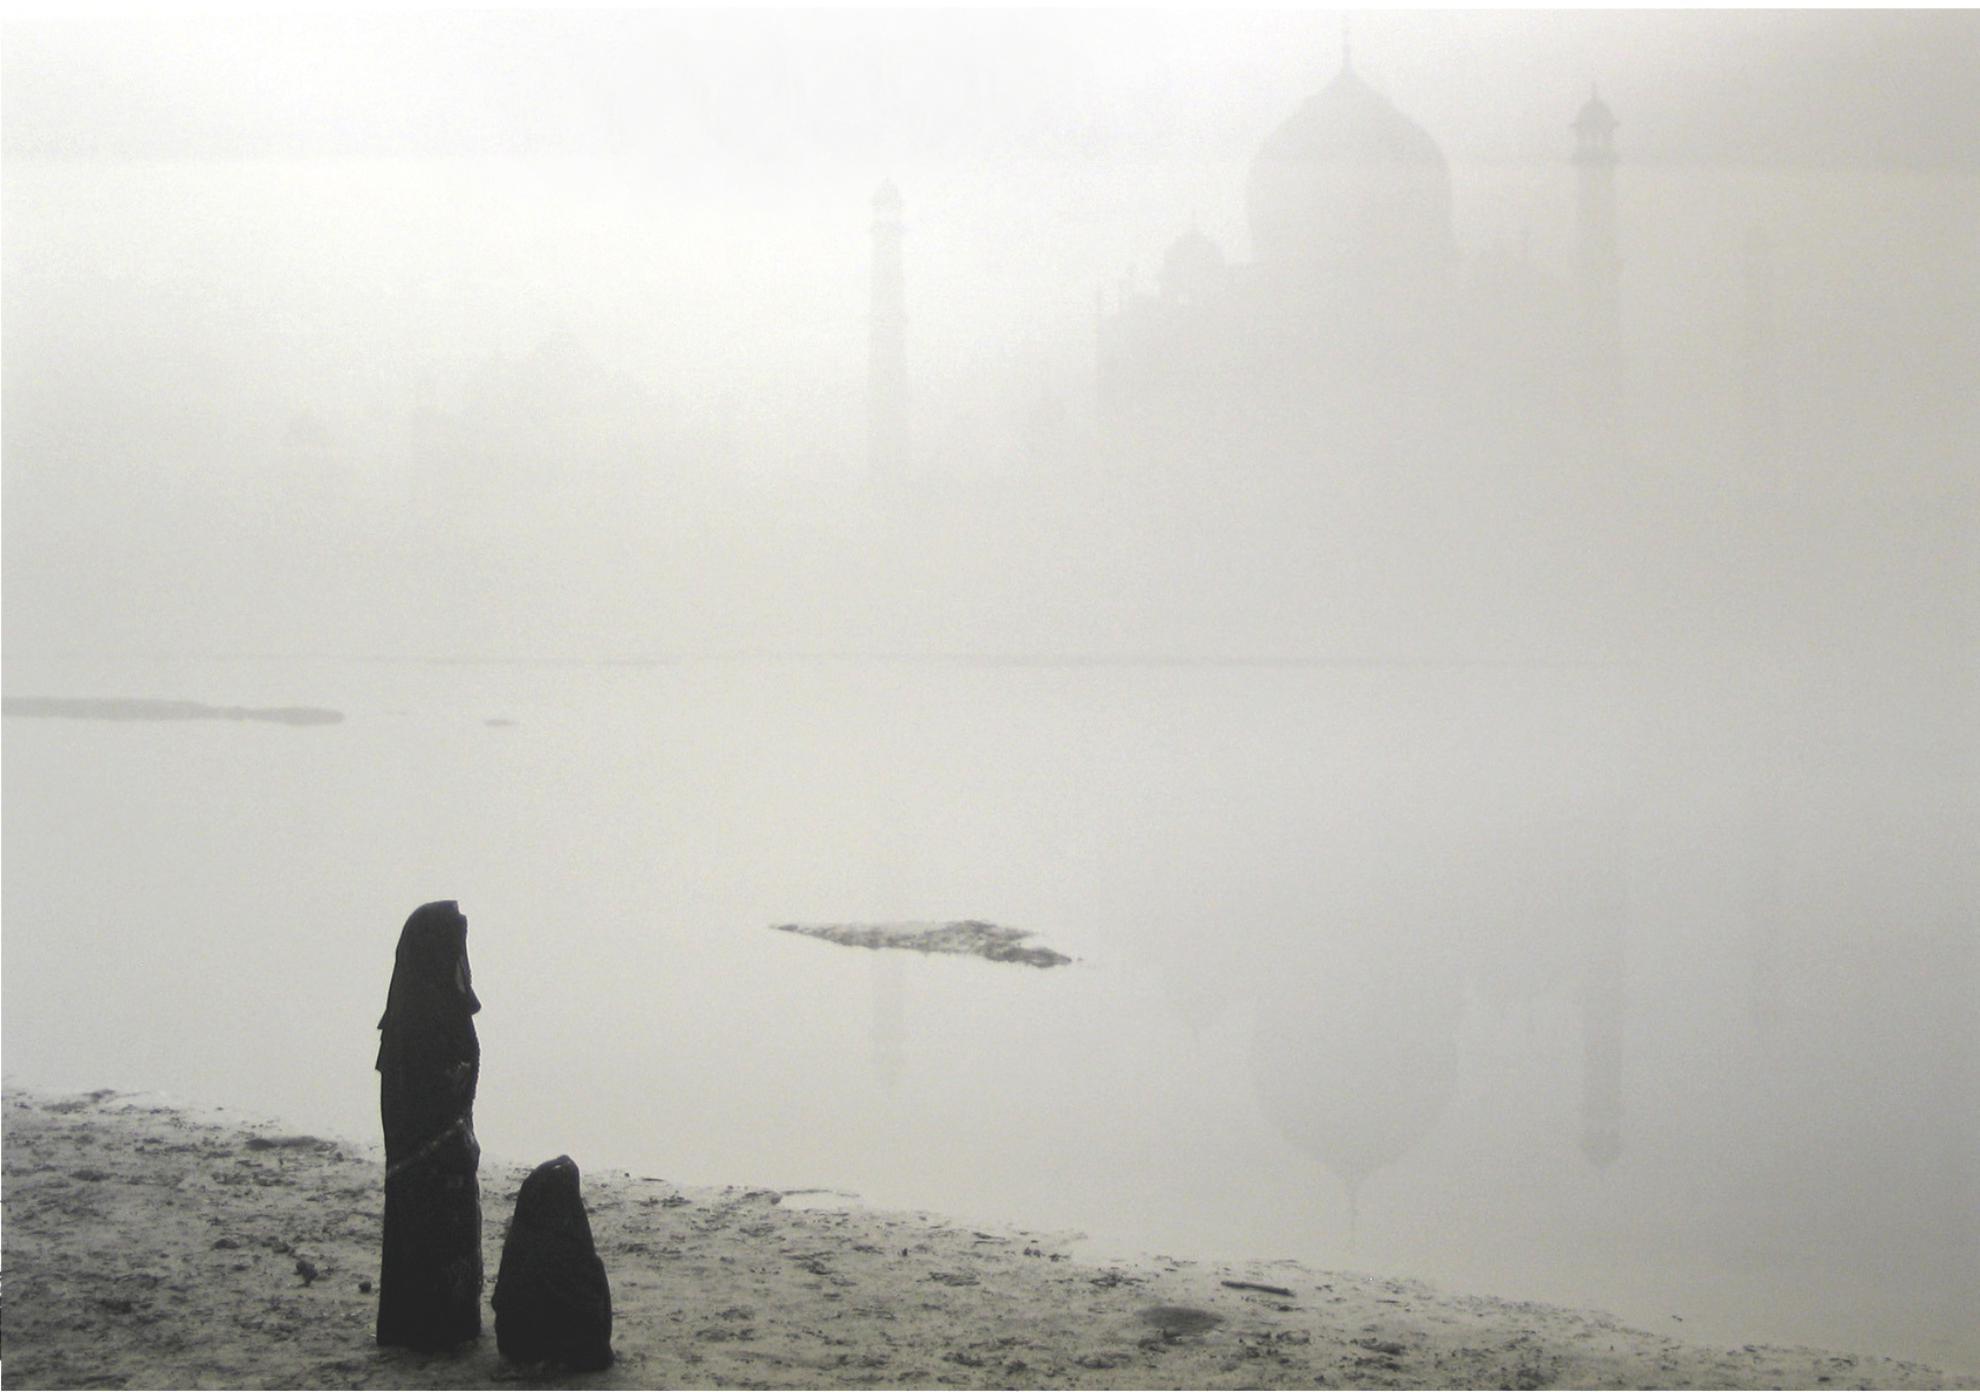 Kenro Izu-Agra #43, India (Taj Mahal)-2008